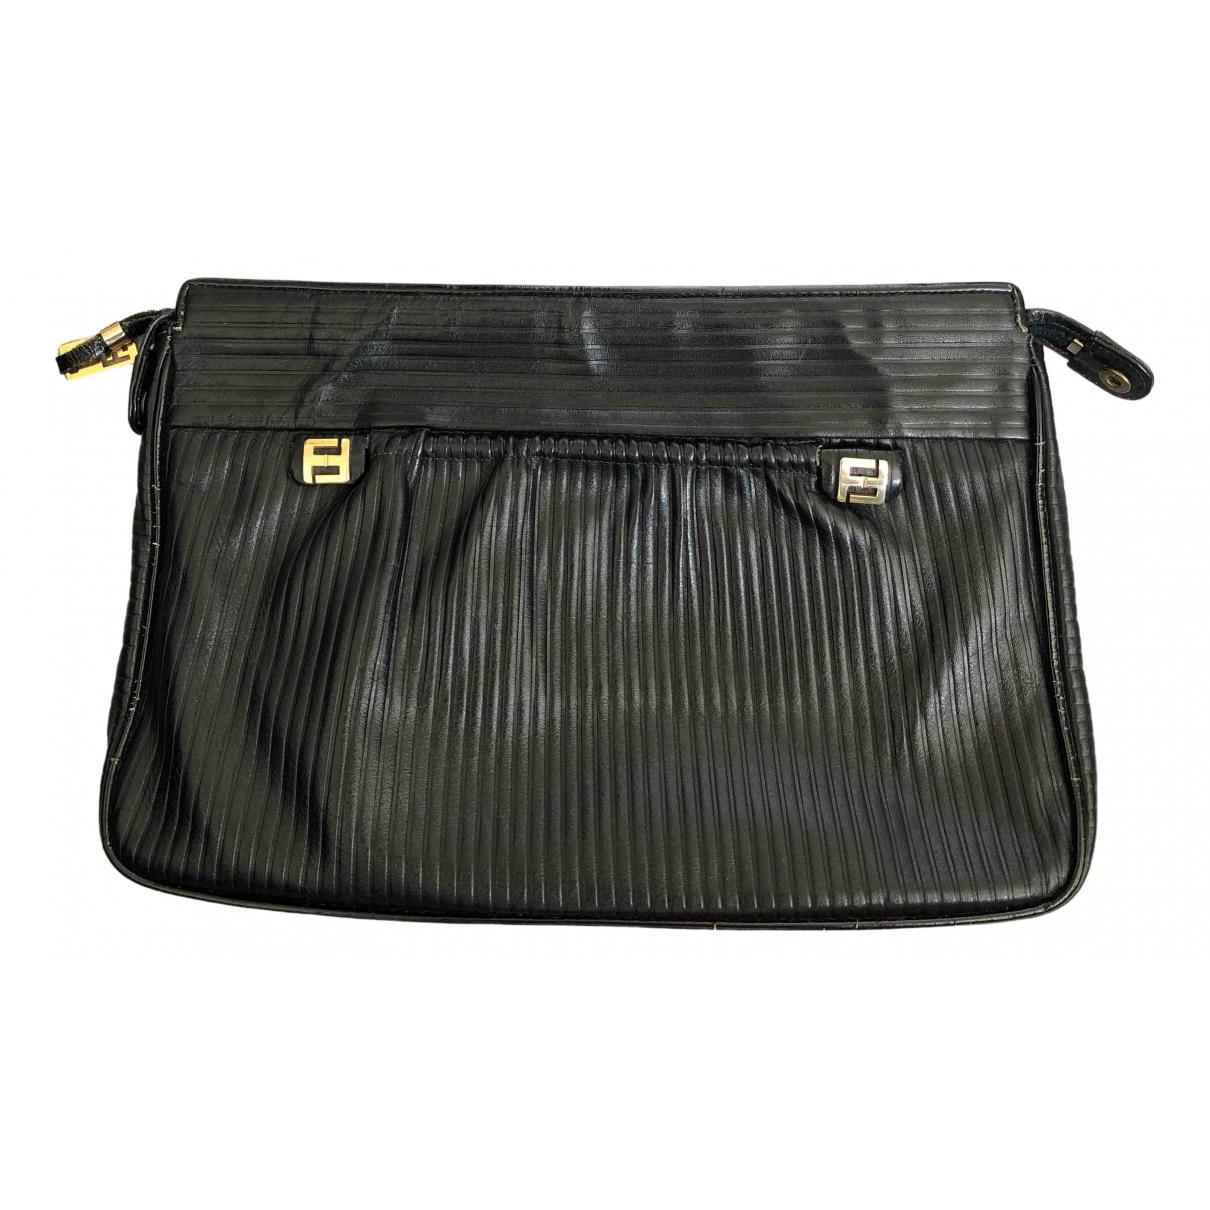 Fendi N Black Leather Clutch bag for Women N